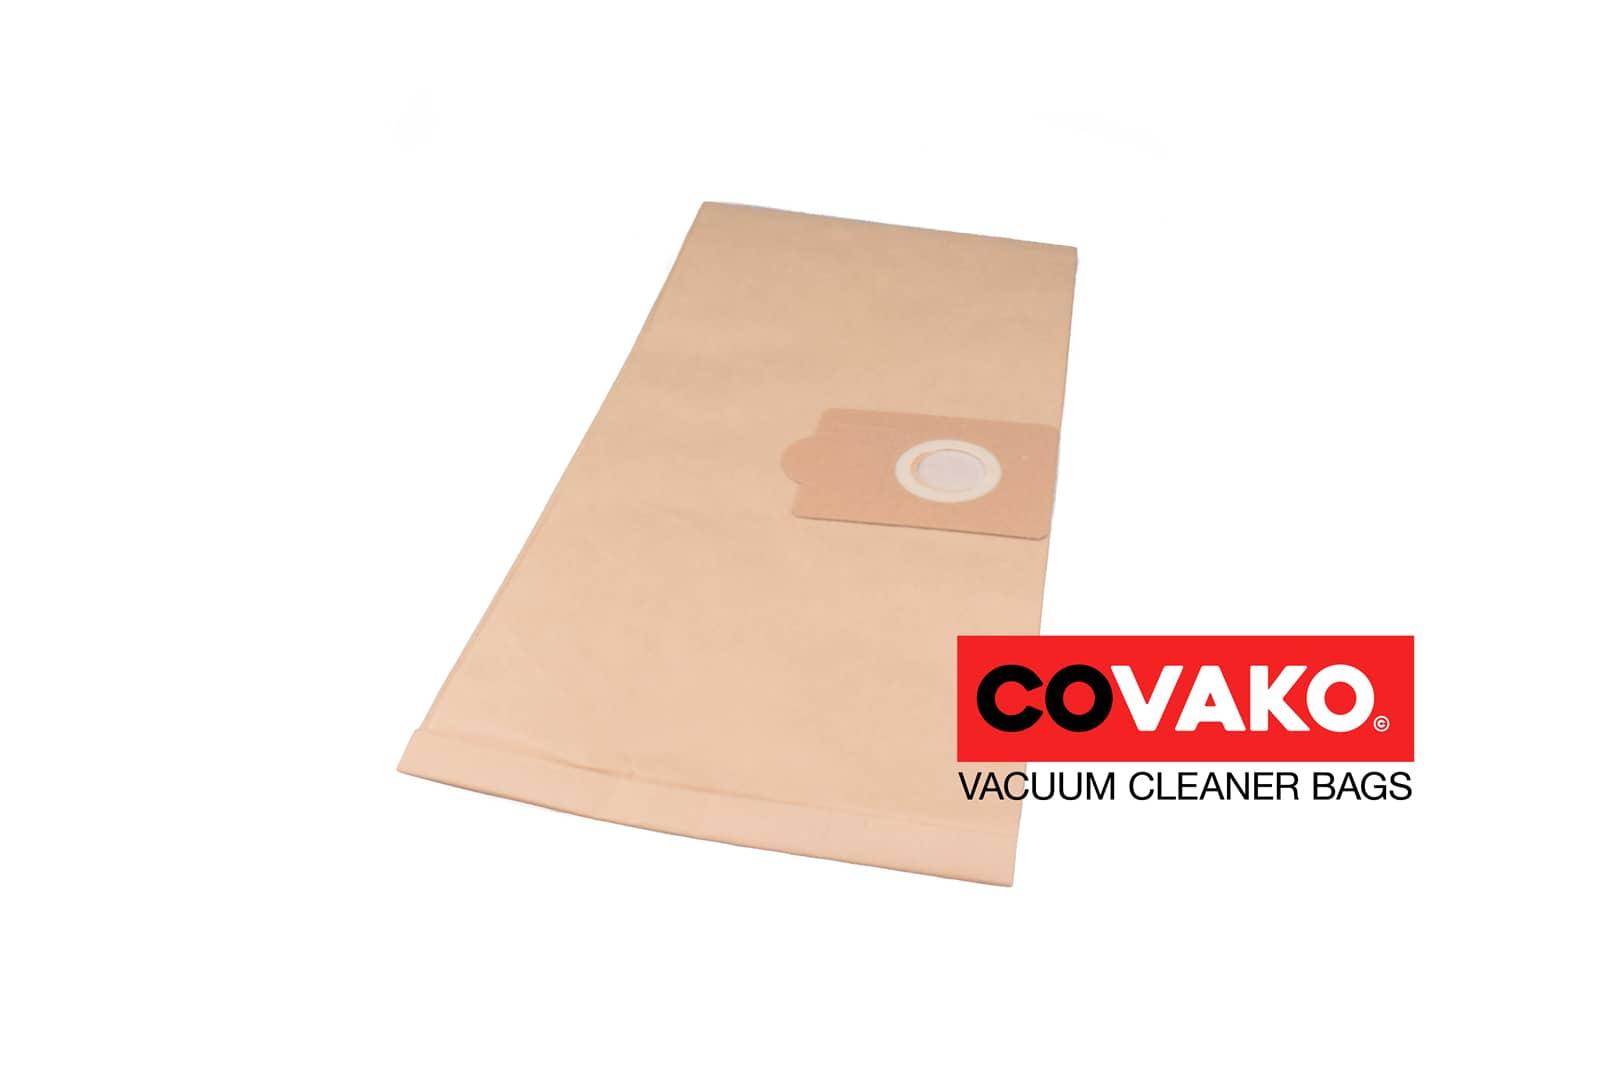 Kenbo Silent 25 / Papier - Kenbo sacs d'aspirateur